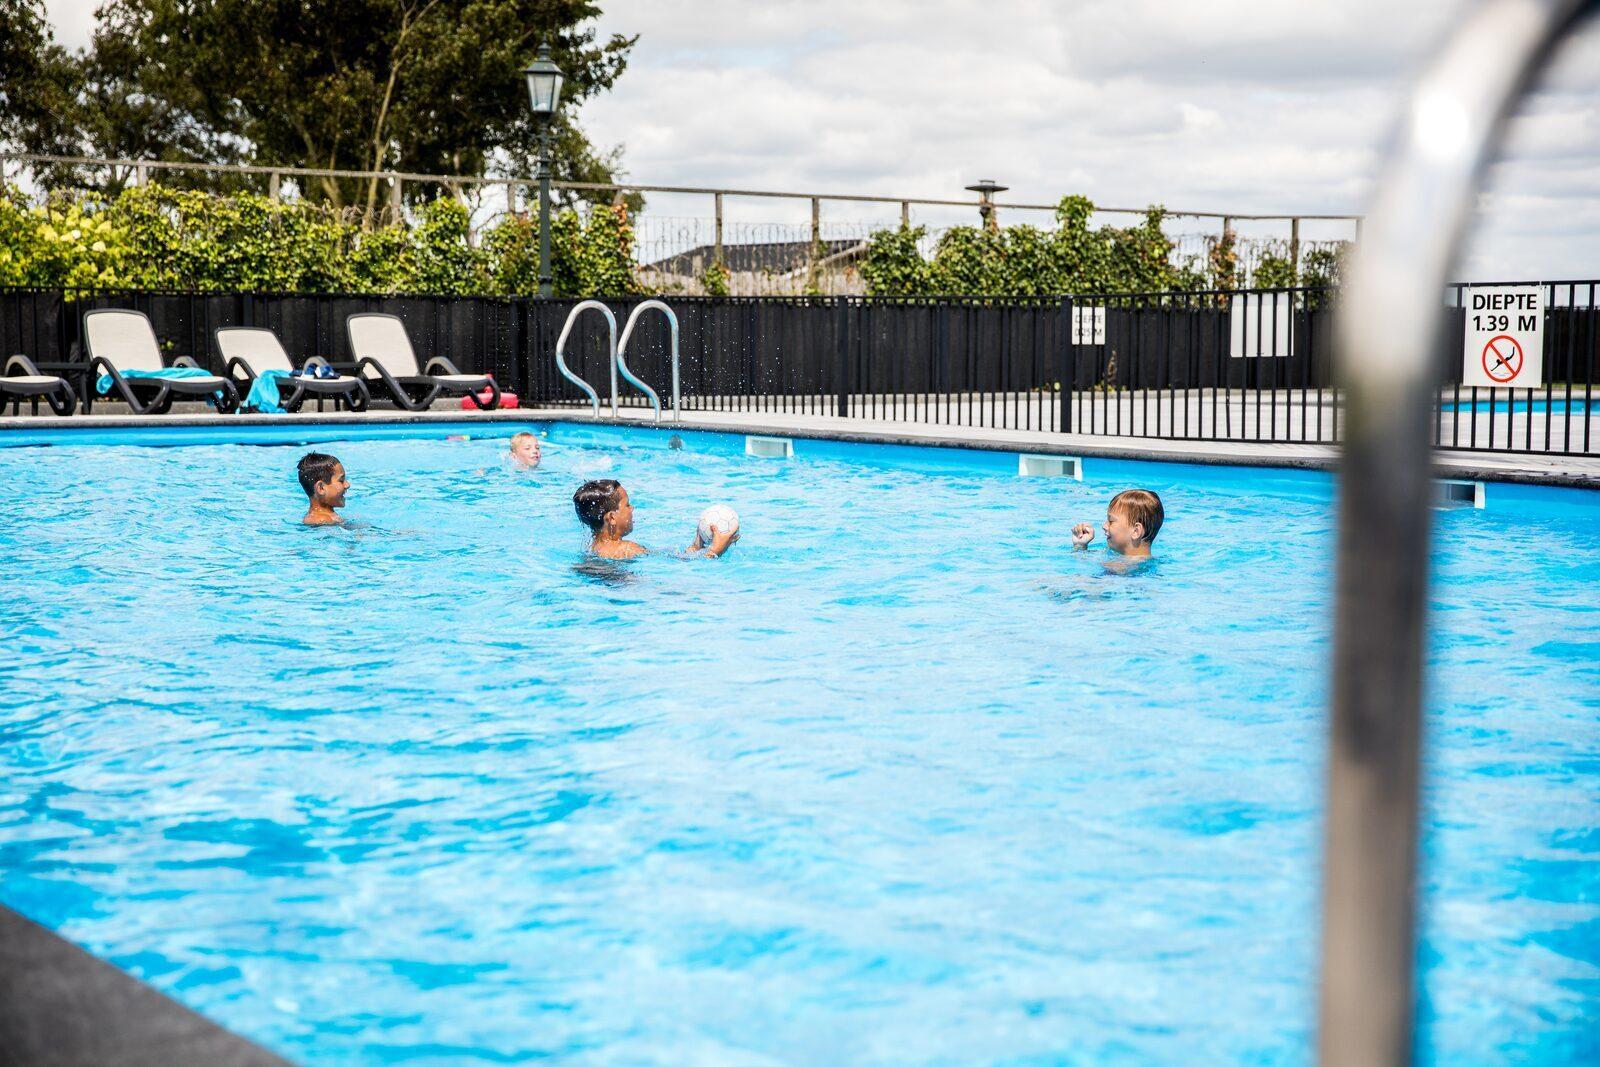 Beheiztes Outdoor-Schwimmbad